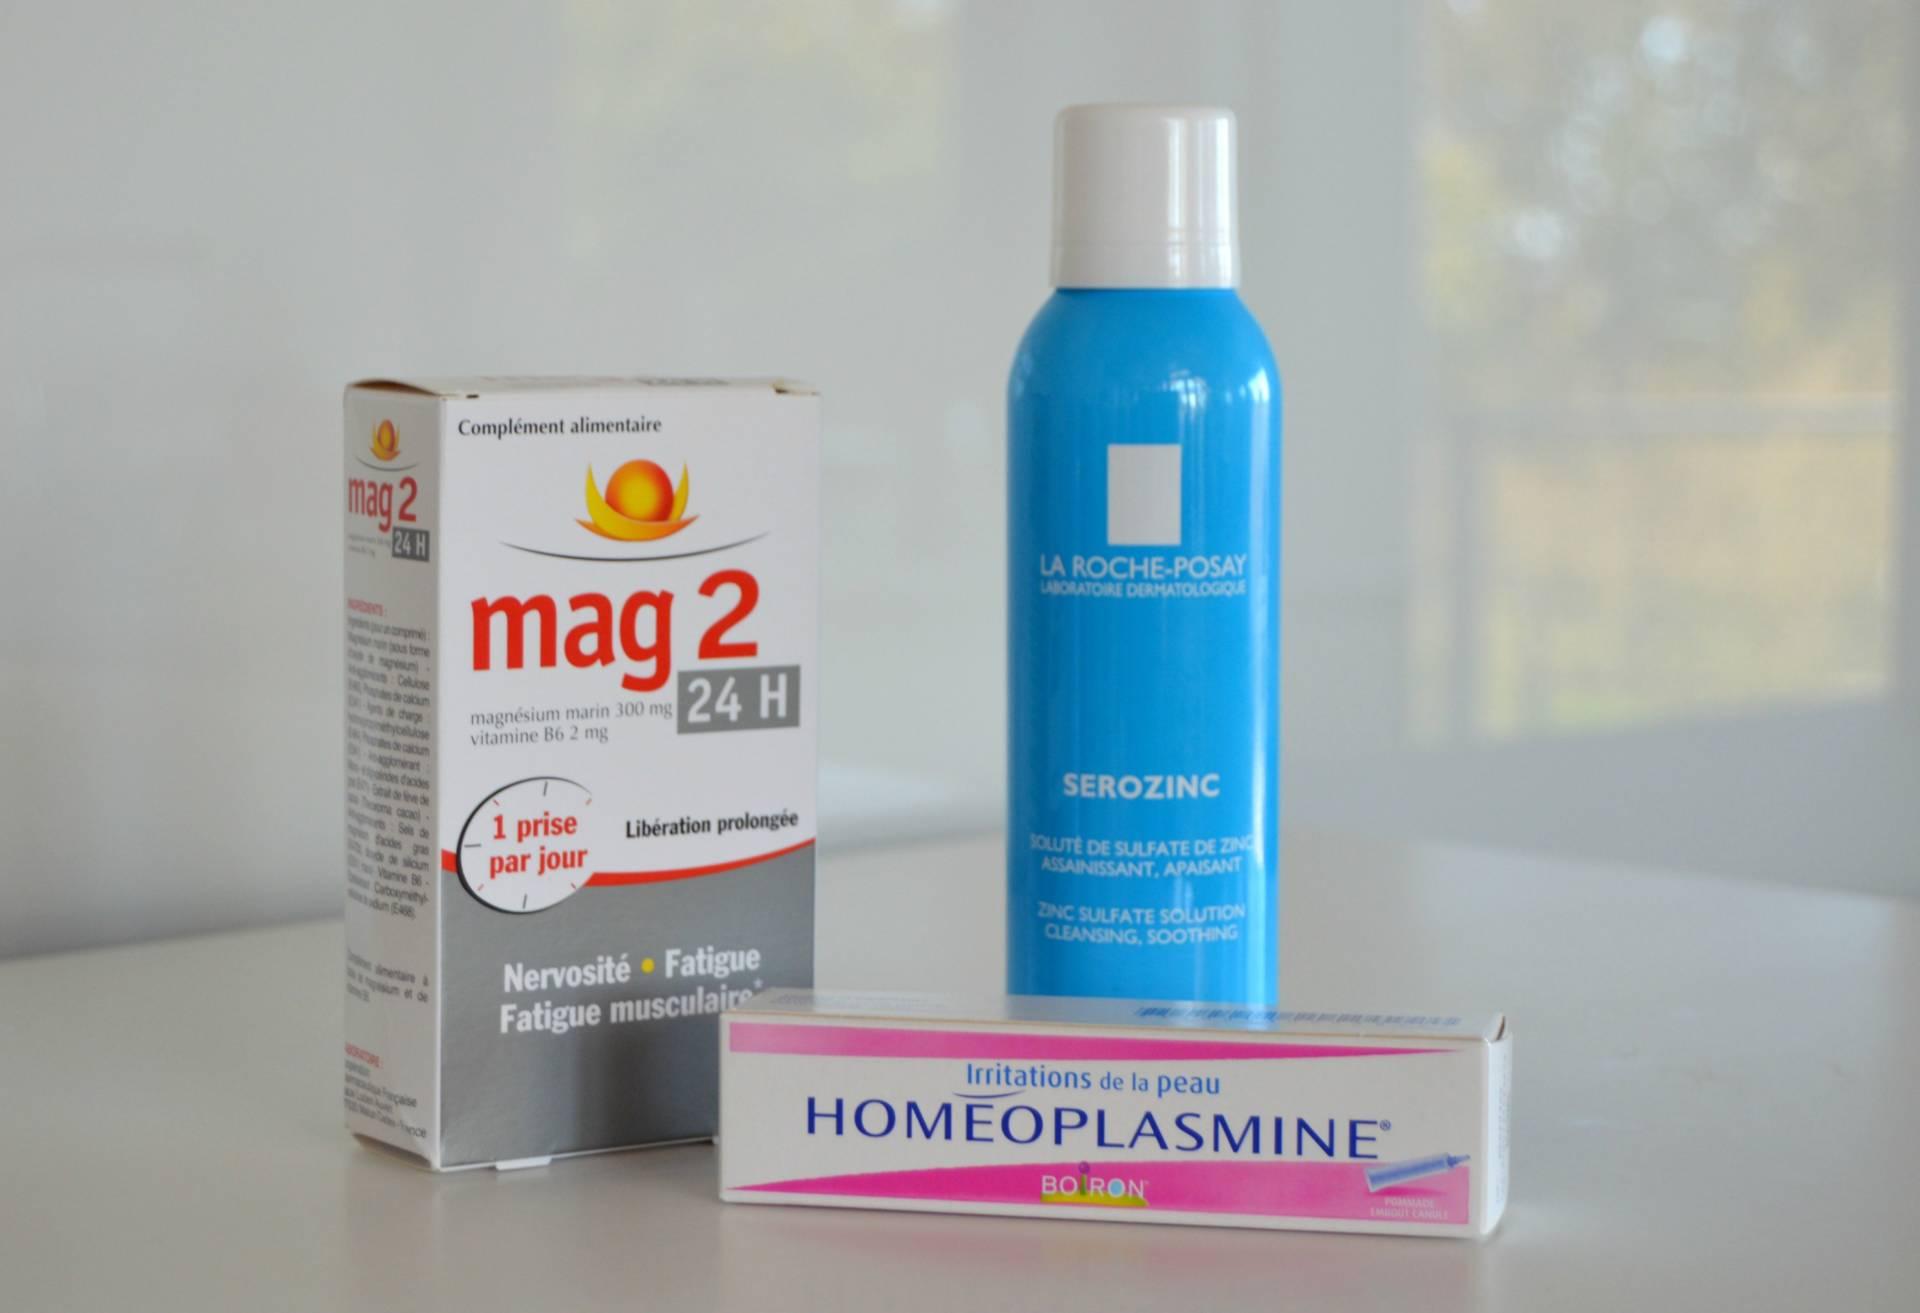 french-pharmacy-haul-inhautepursuit-serozinc-mag-2-homeplasmine